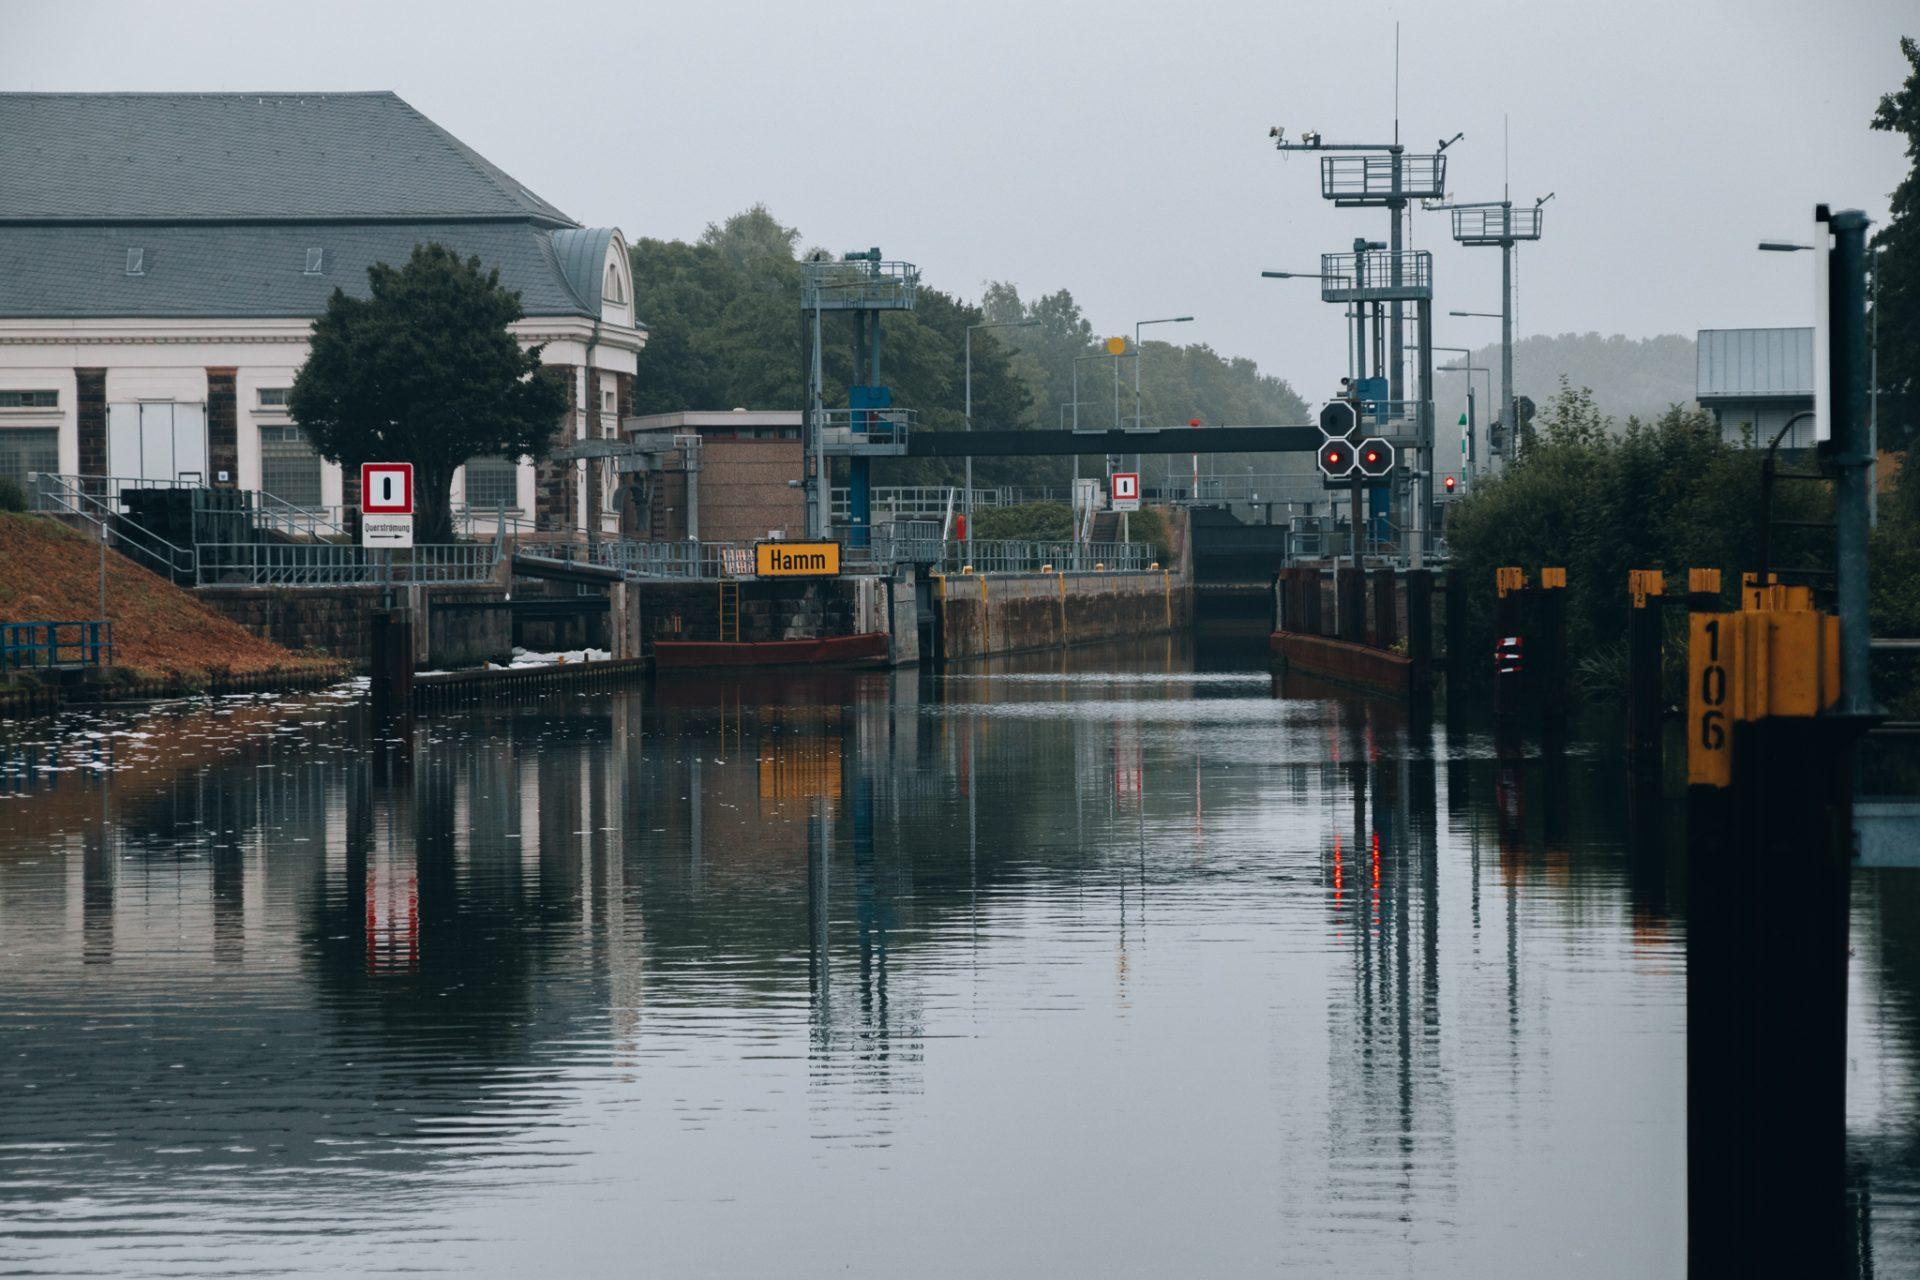 Datteln-Hamm-Kanal